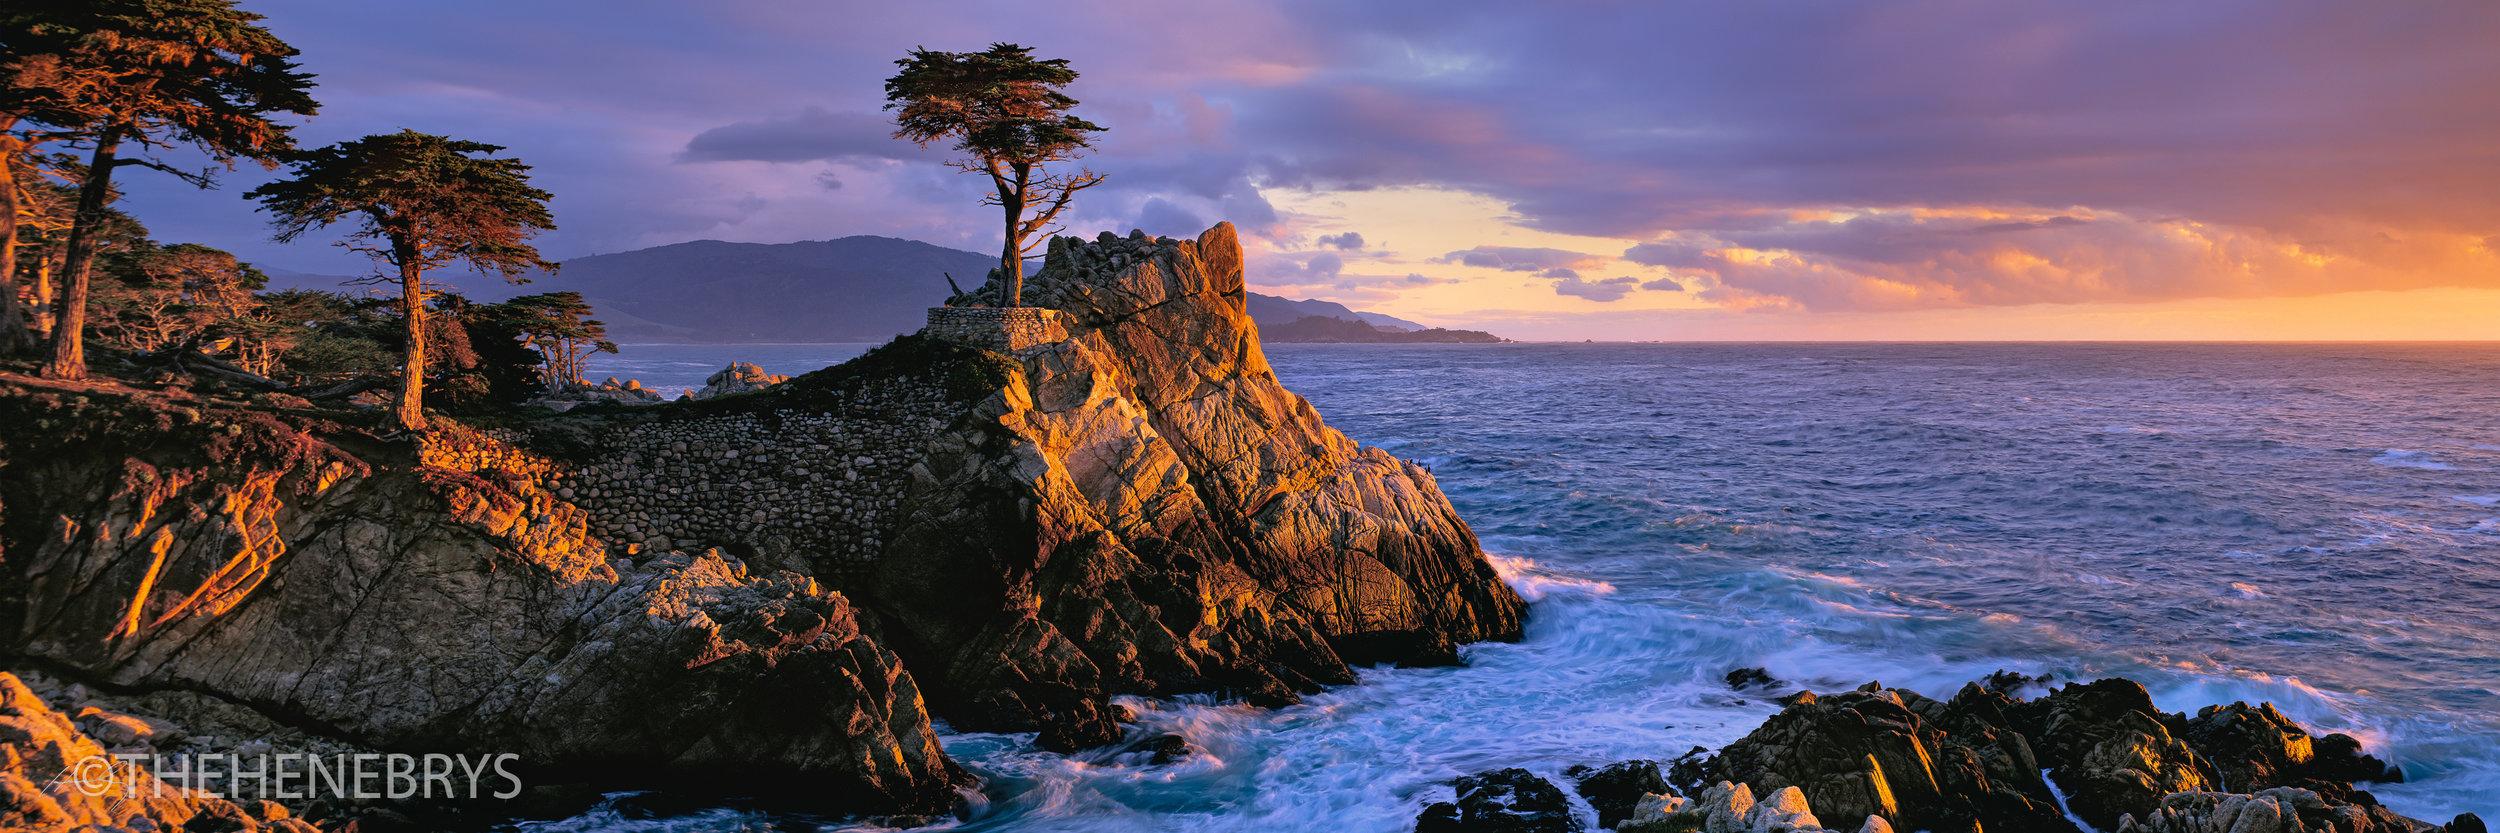 """A Test of Time"" 18th Pebble Beach Golf Links®, California"